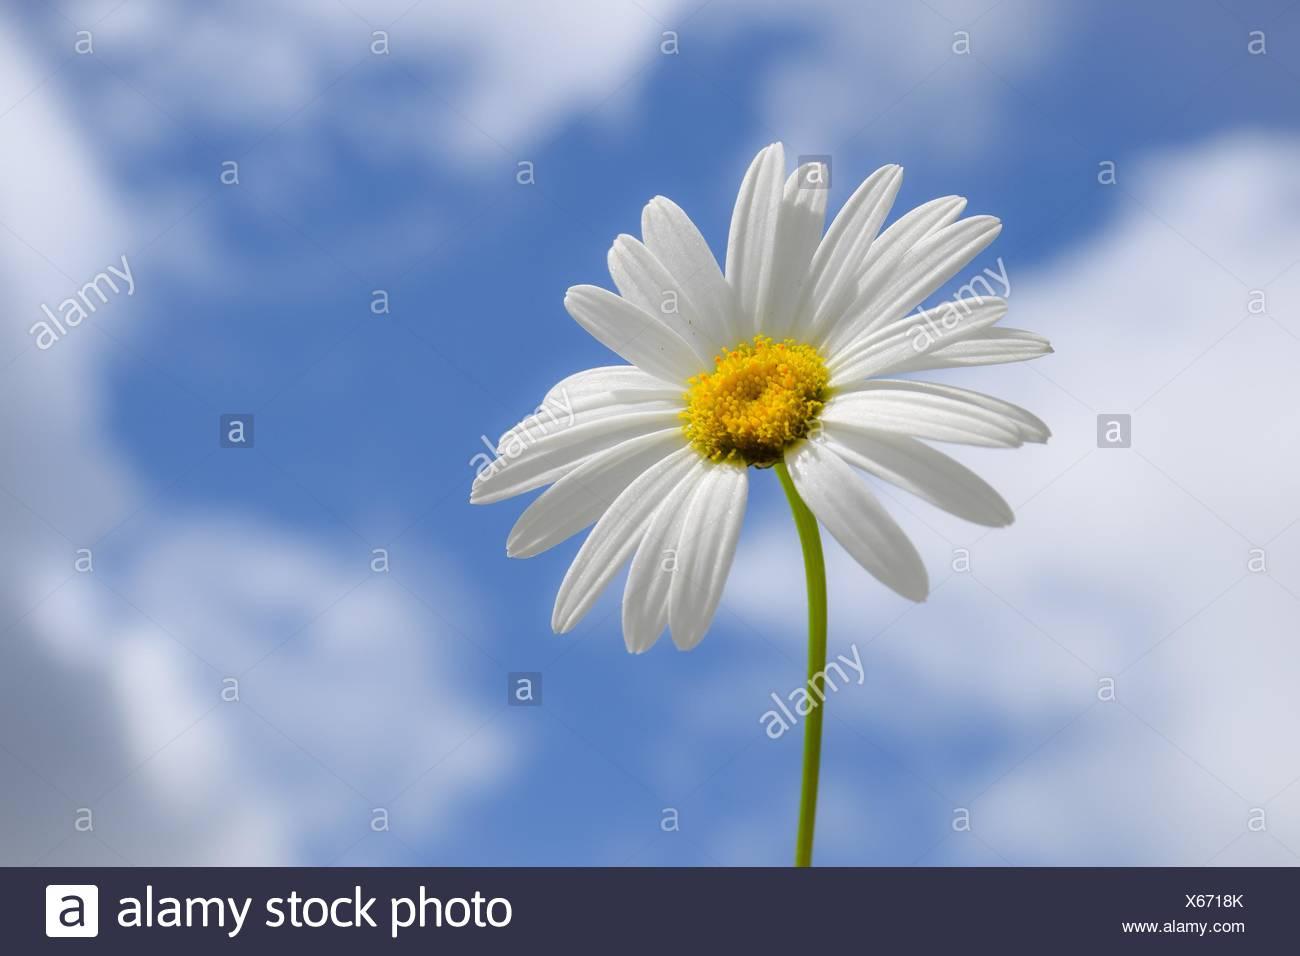 Daisy flower against partly cloudy blue sky - Stock Image